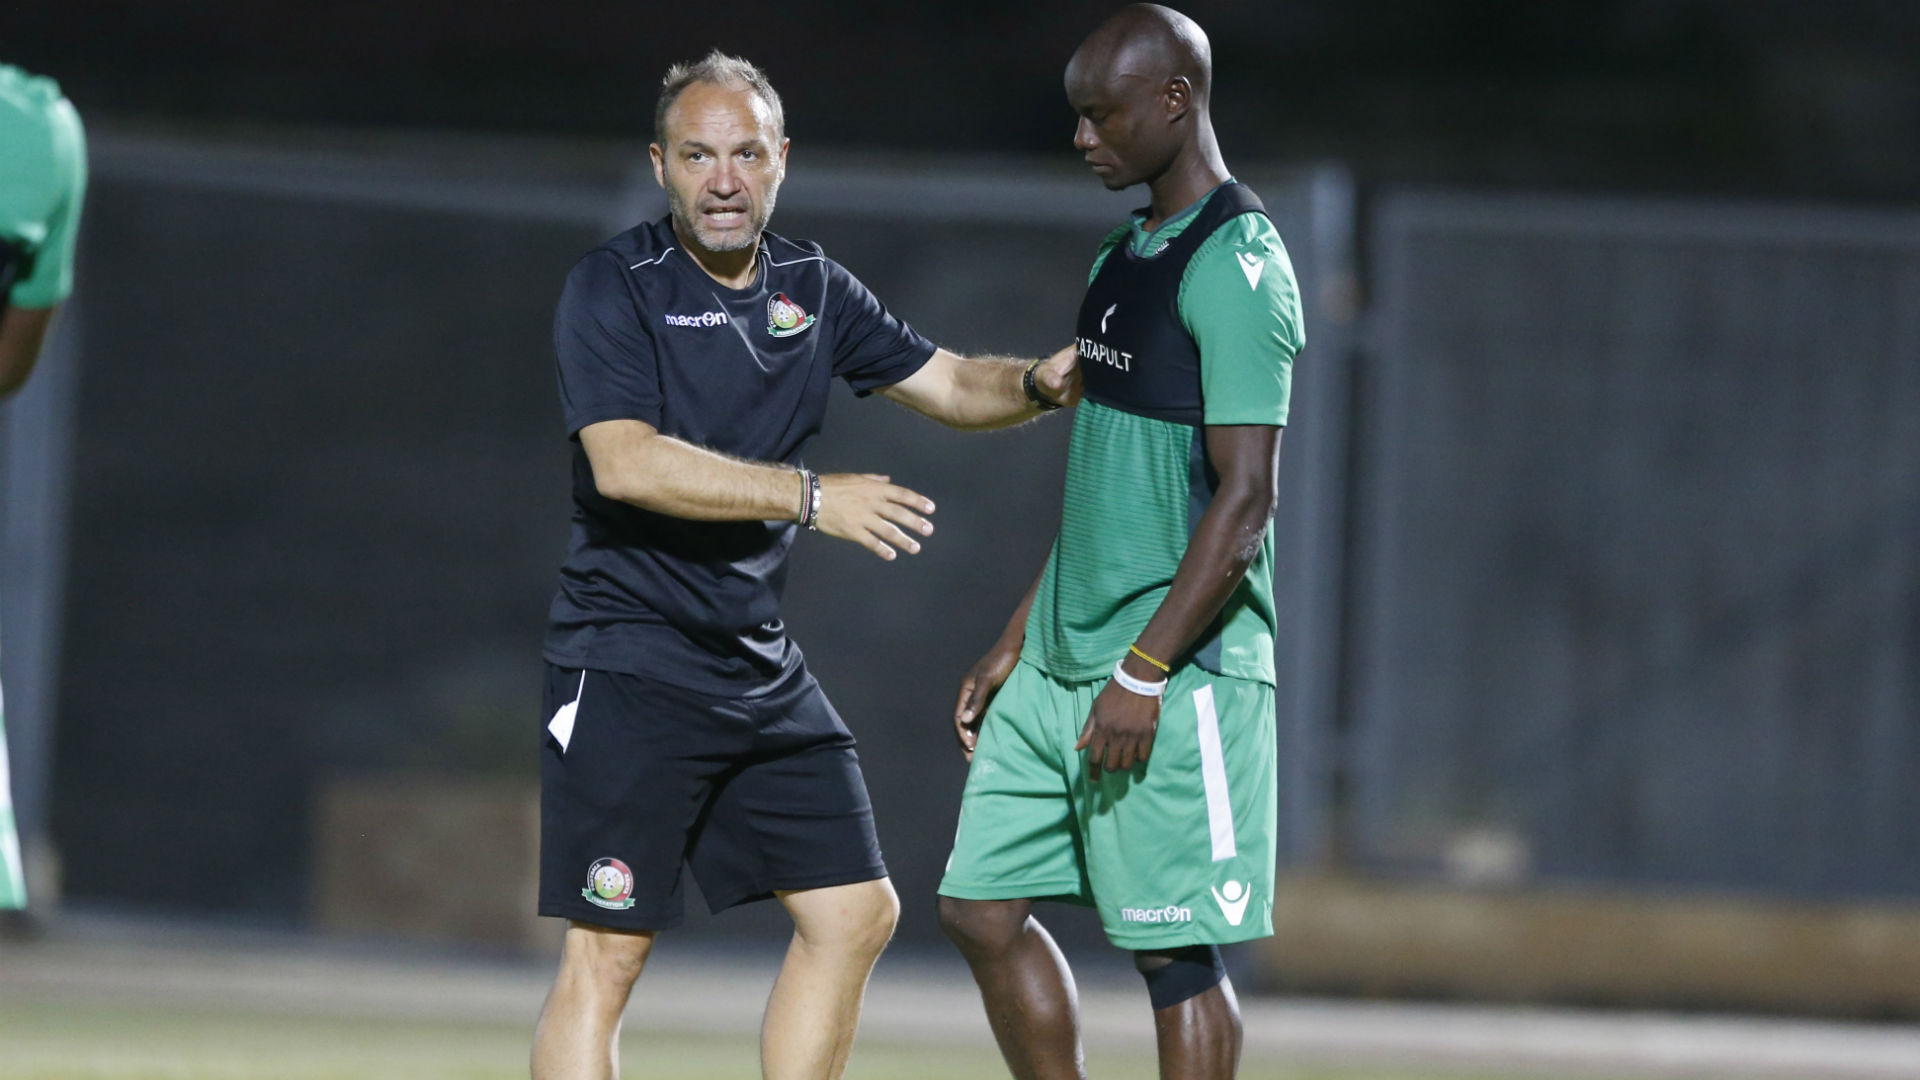 Afcon: Harambee Stars coach Sebastien Migne blasts organisers for lack of internet at team hotel